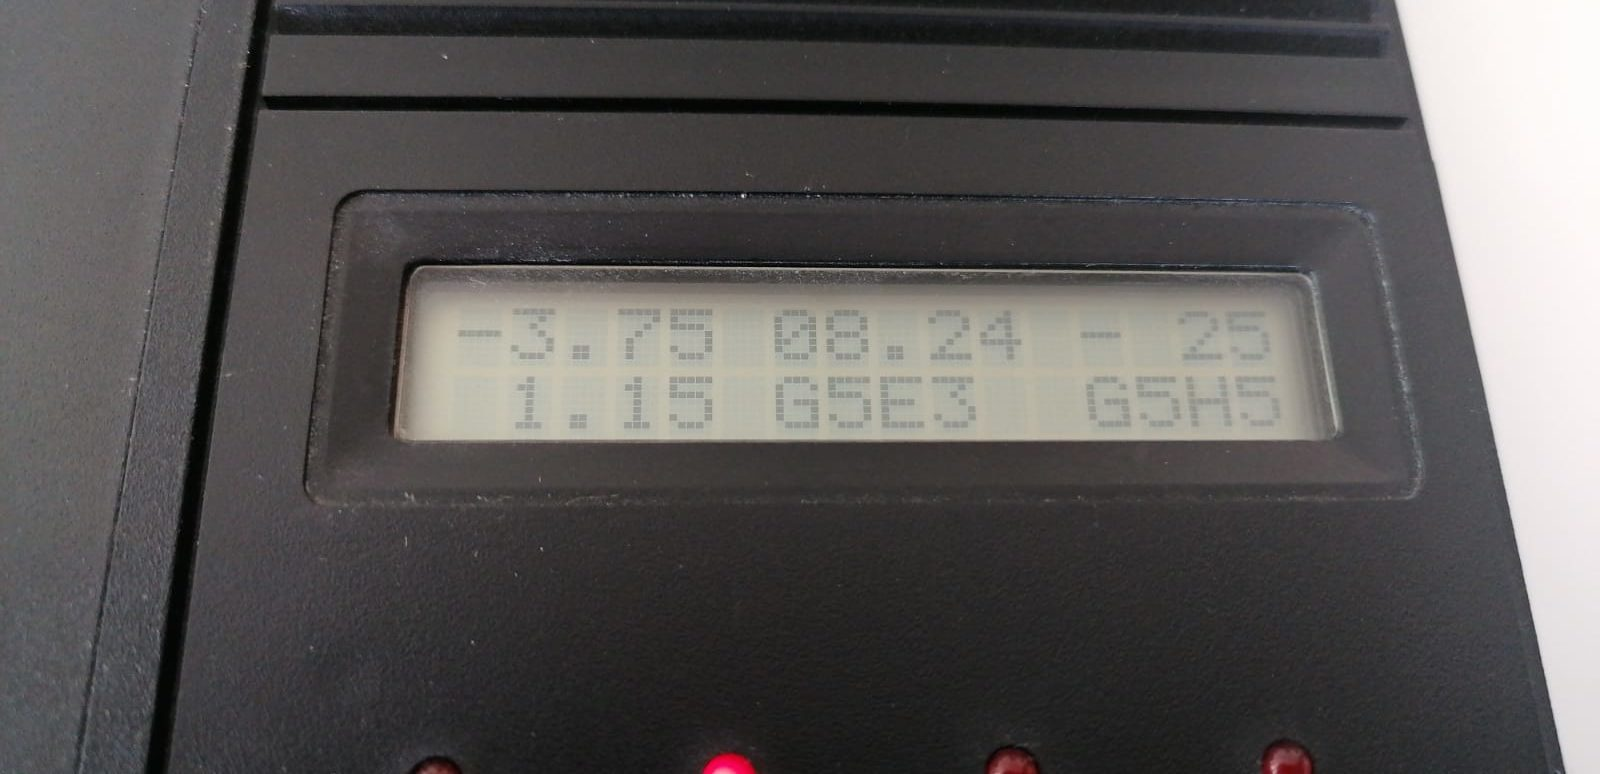 Mephisto Nigel Short 100 Mhz